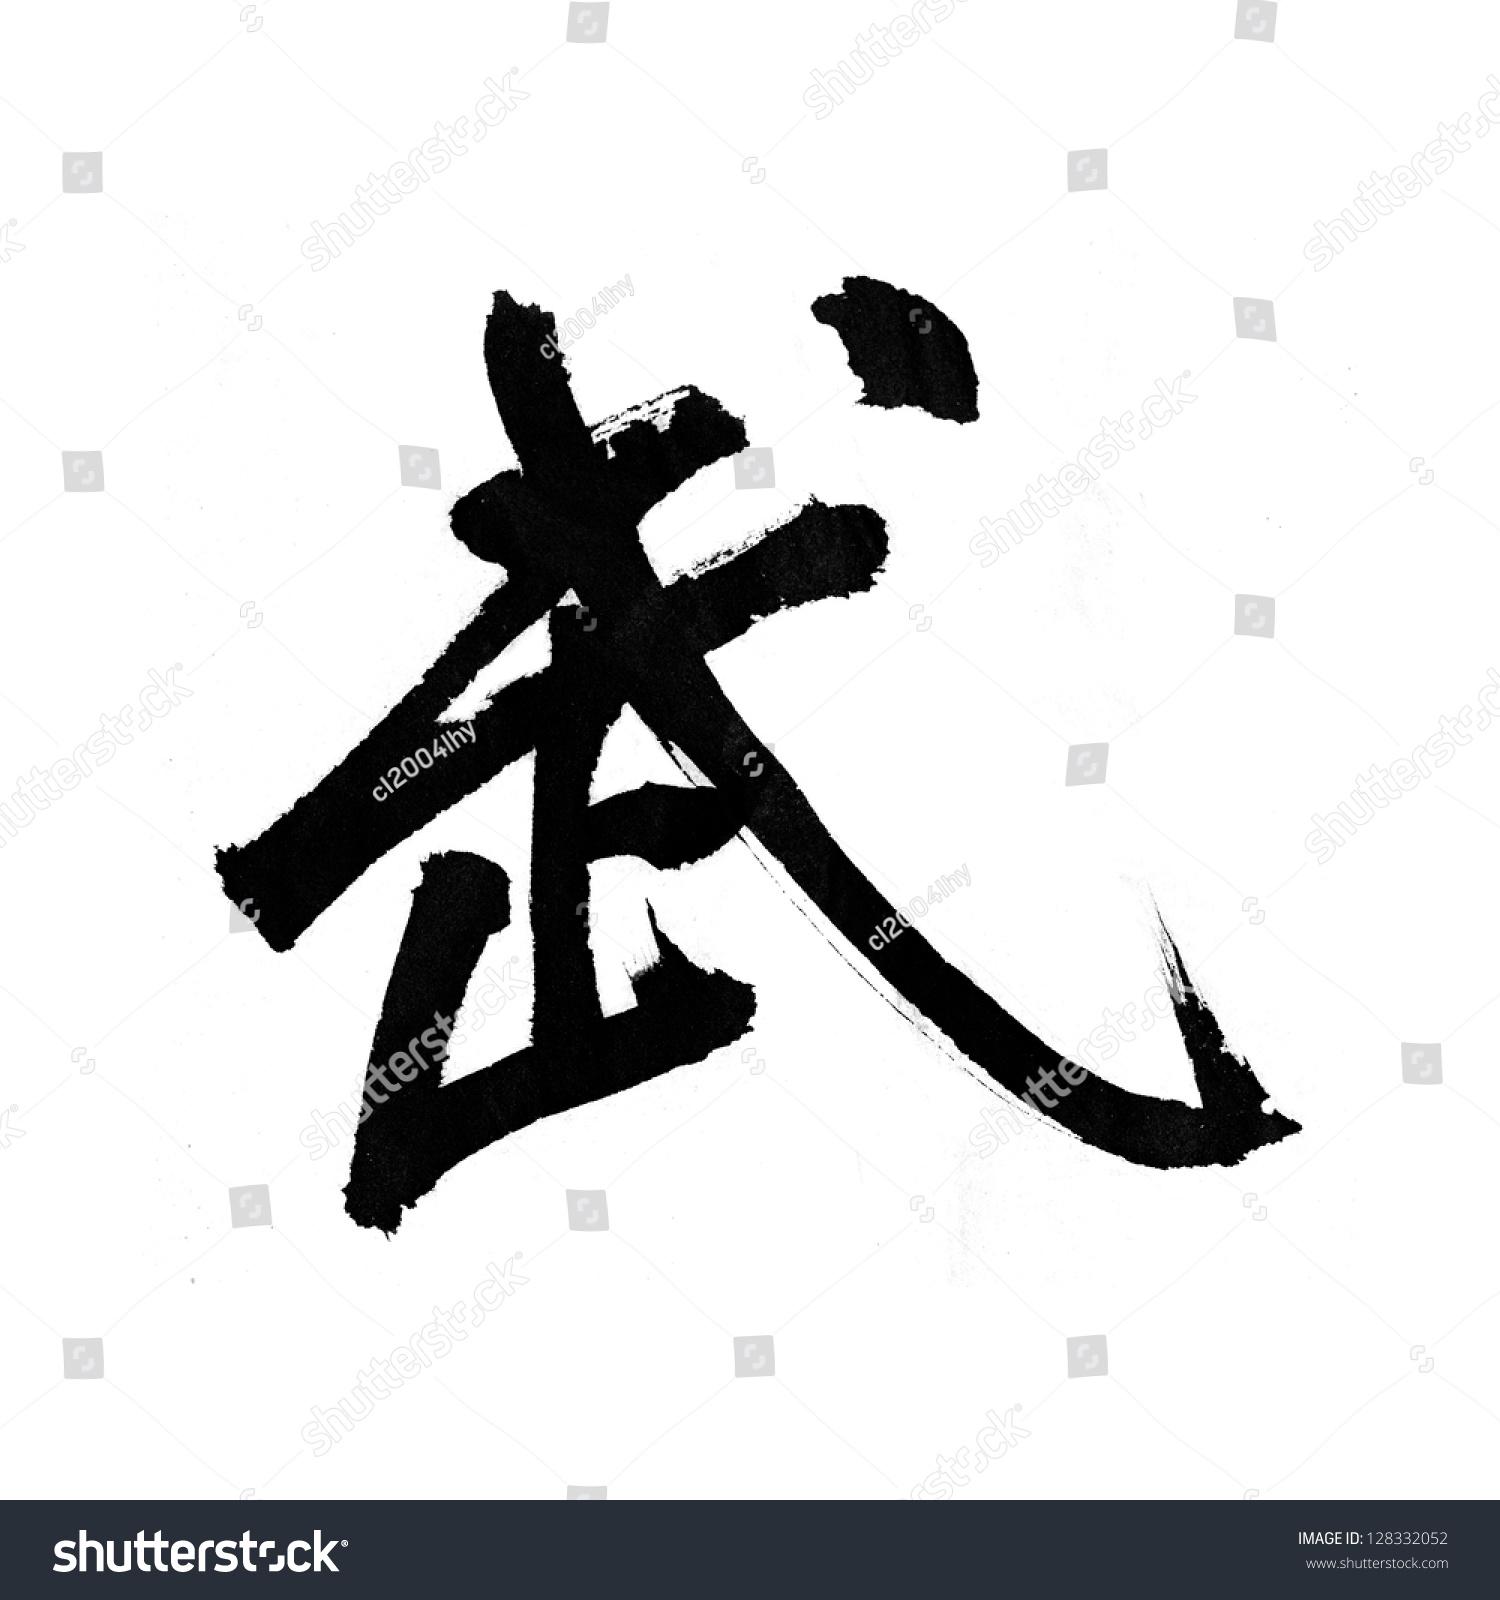 Black Hand Drawn Hieroglyphs Which Translation Is Sense Or Feeling